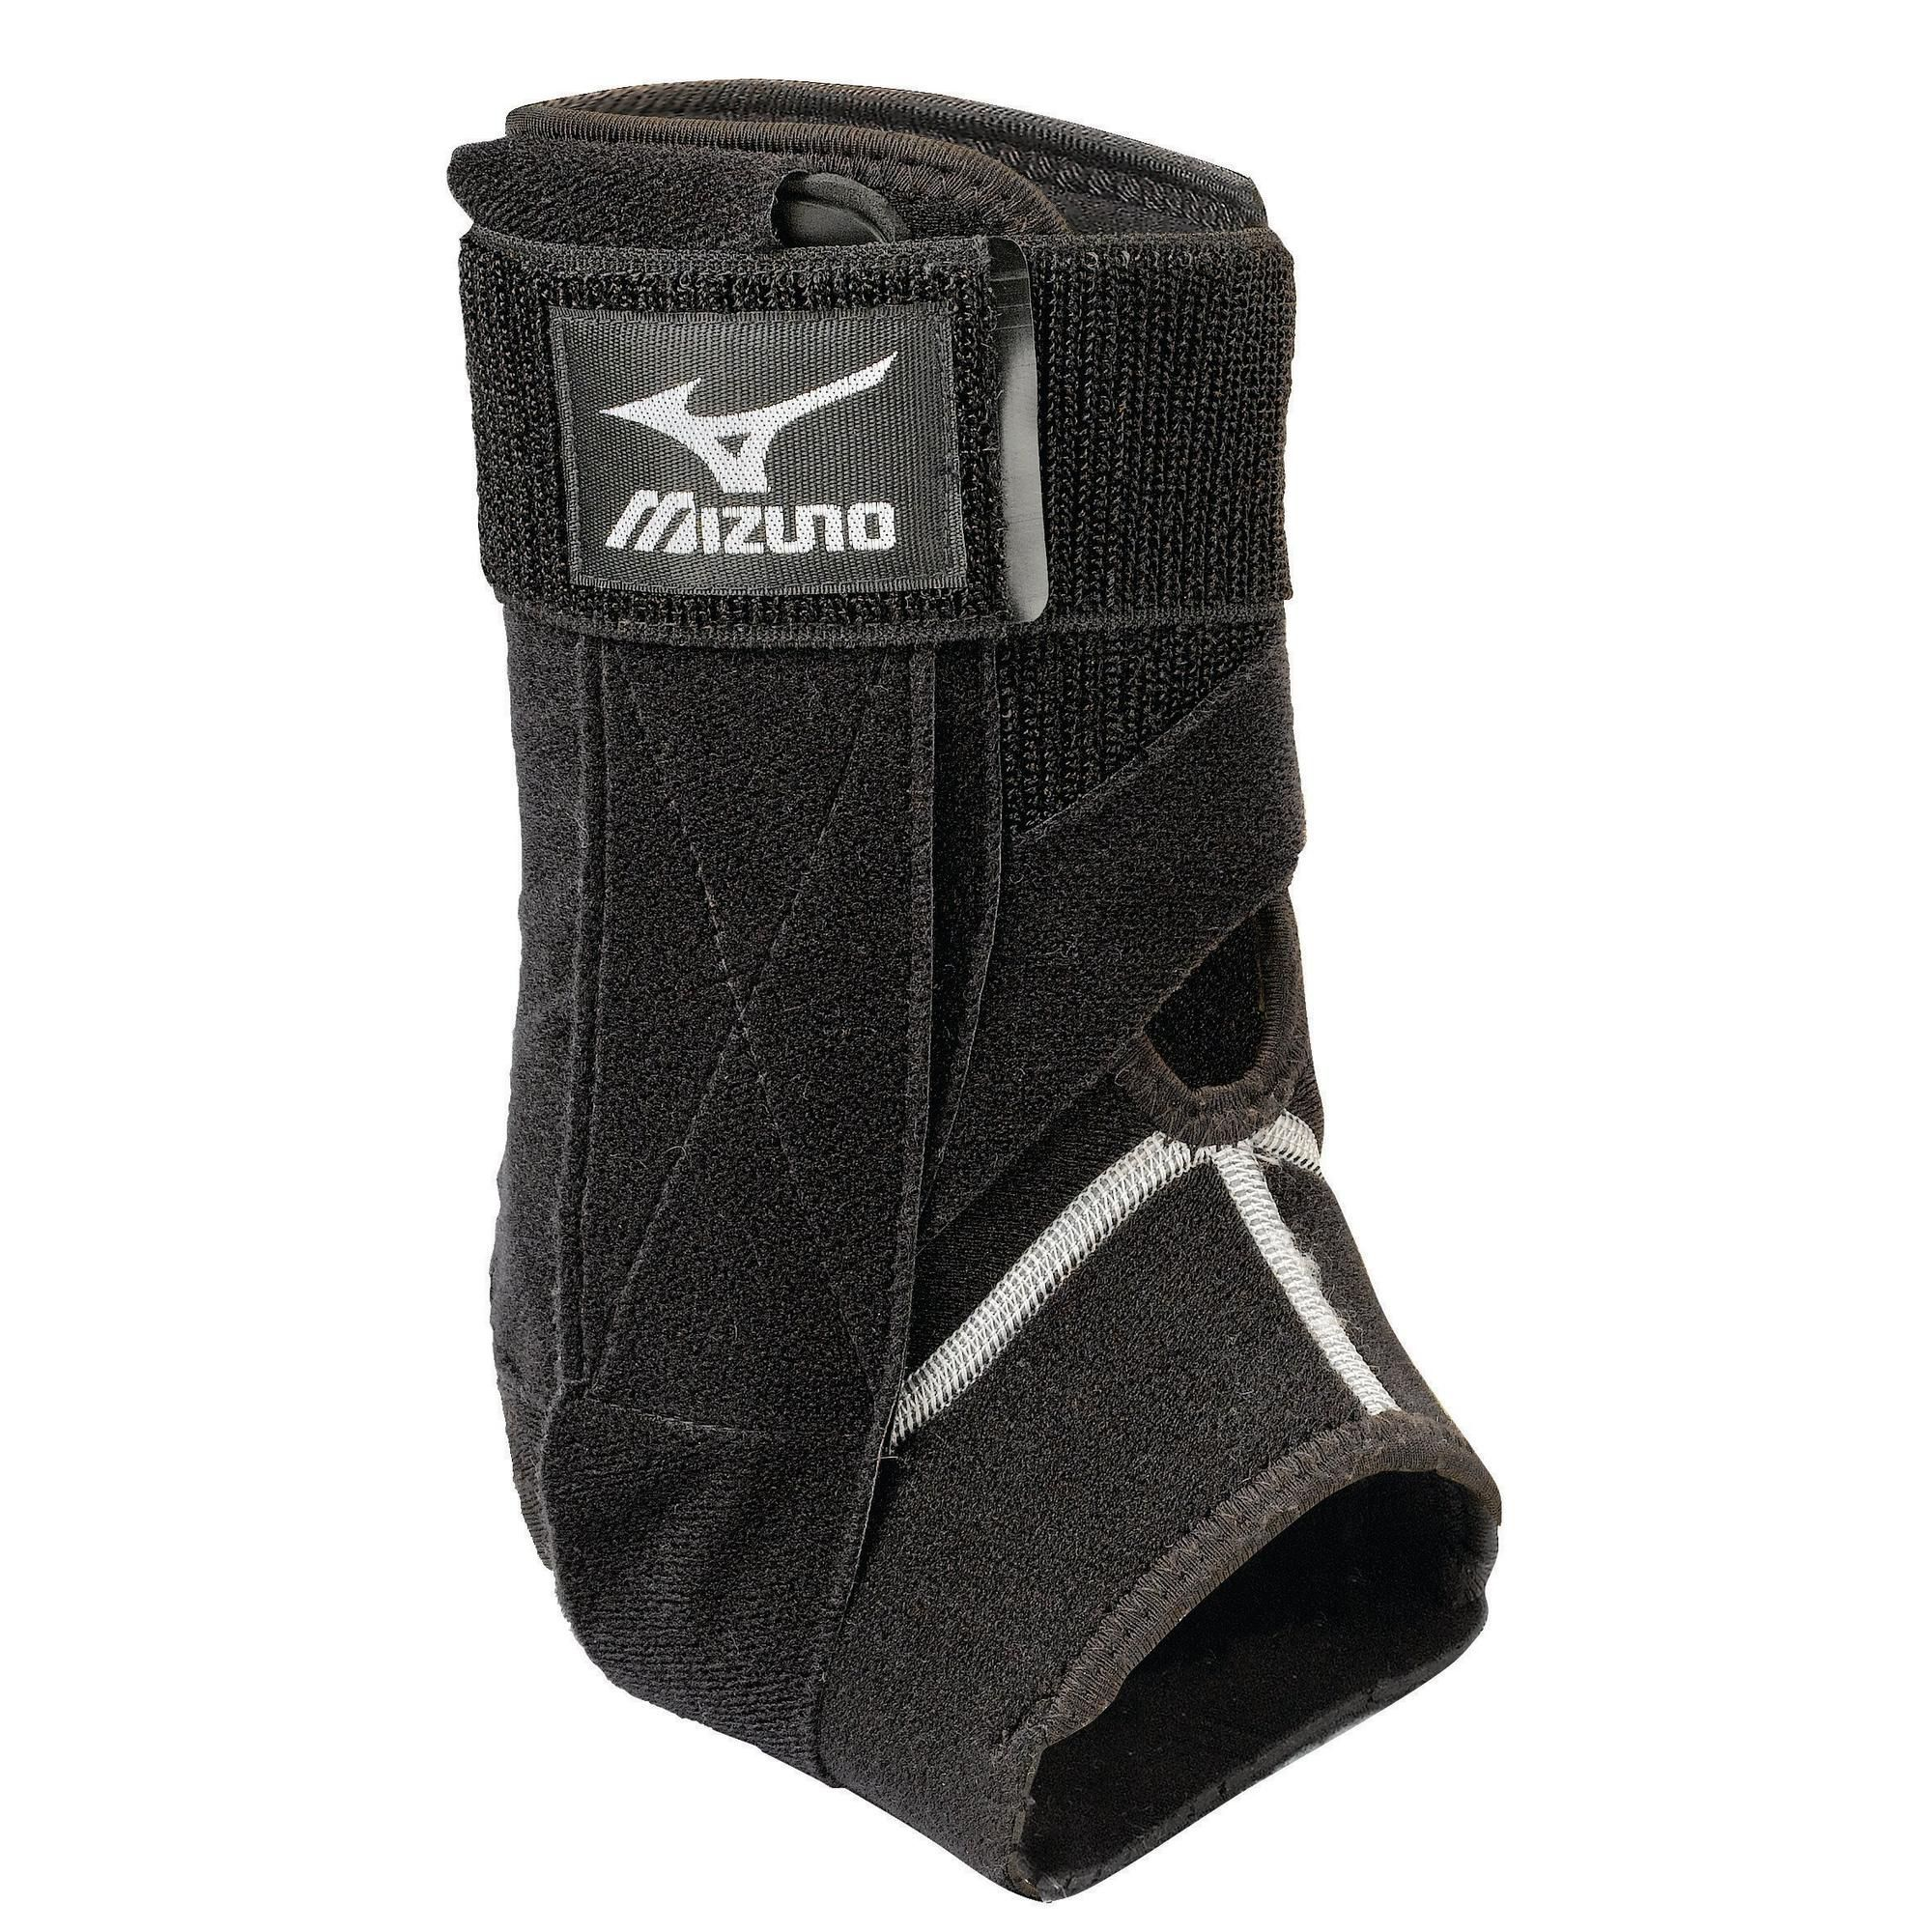 Mizuno Dxs2 Ankle Brace Size Large In 2020 Volleyball Ankle Braces Ankle Braces Mizuno Volleyball